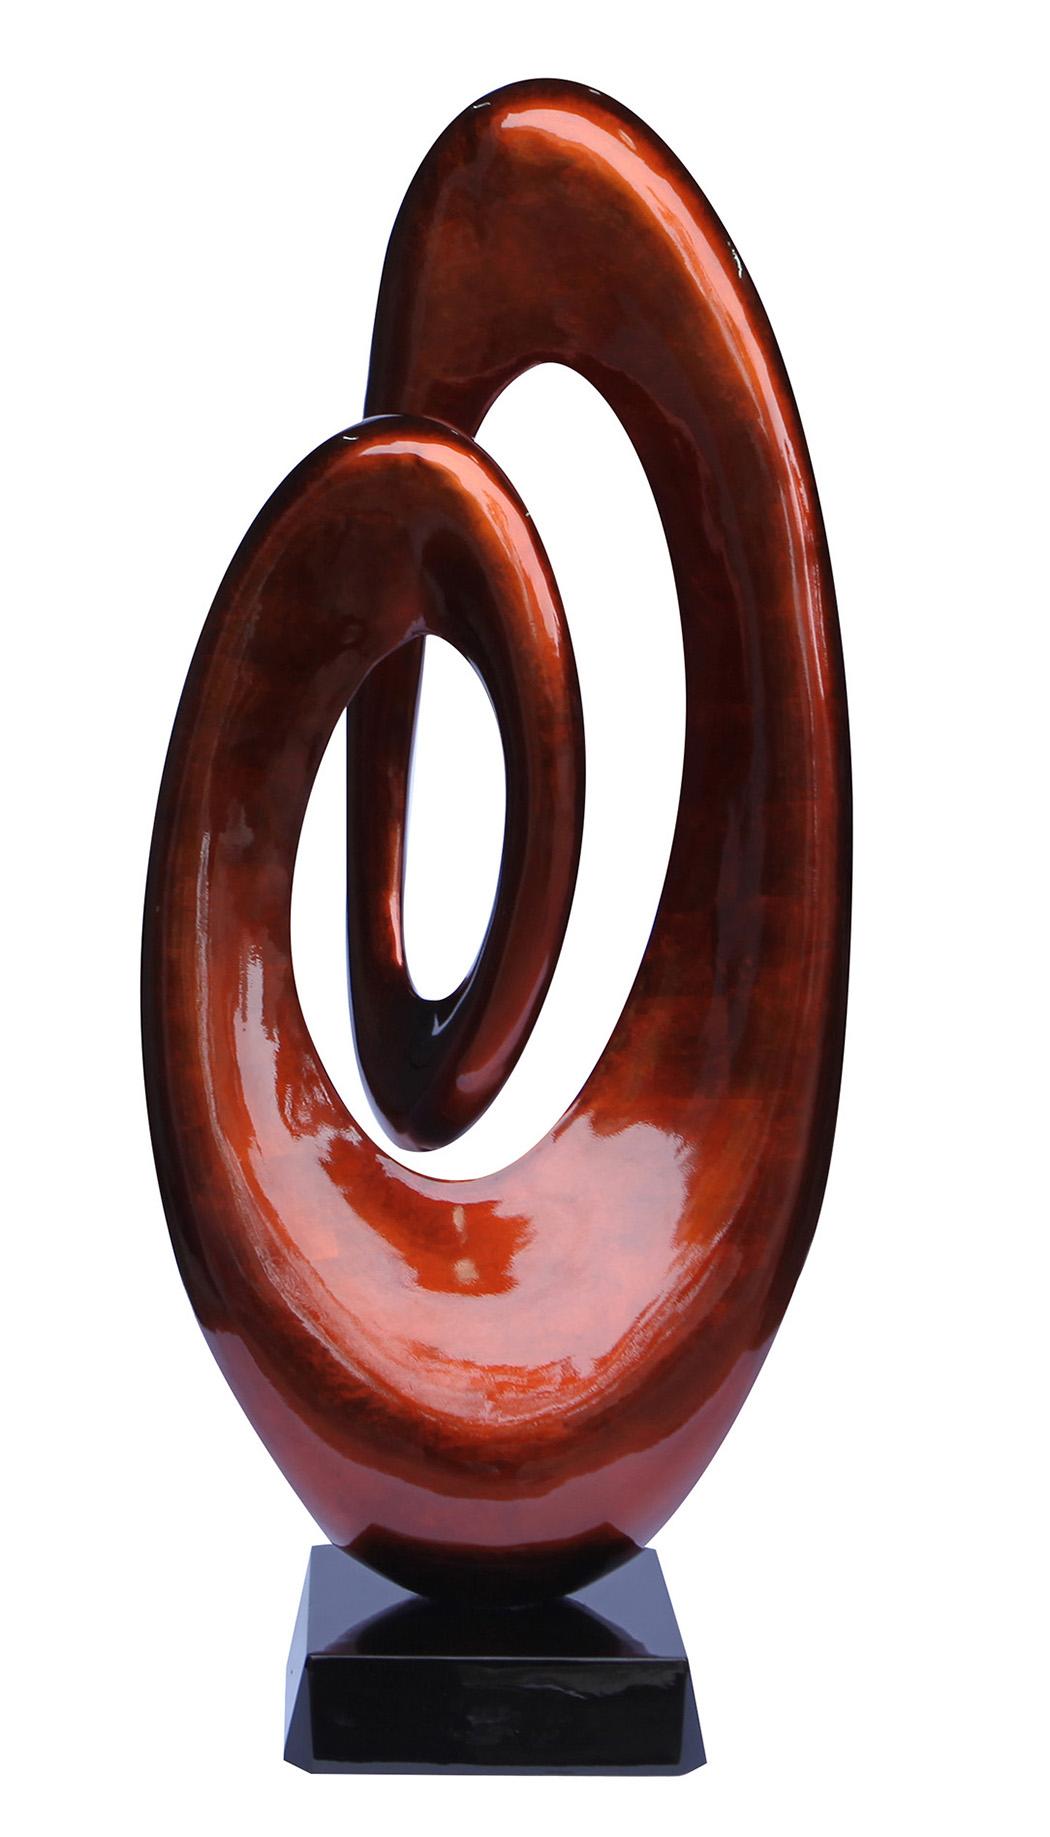 DL03-B-Dl03 B Talia Design 29 Inchcontempo Sculpture